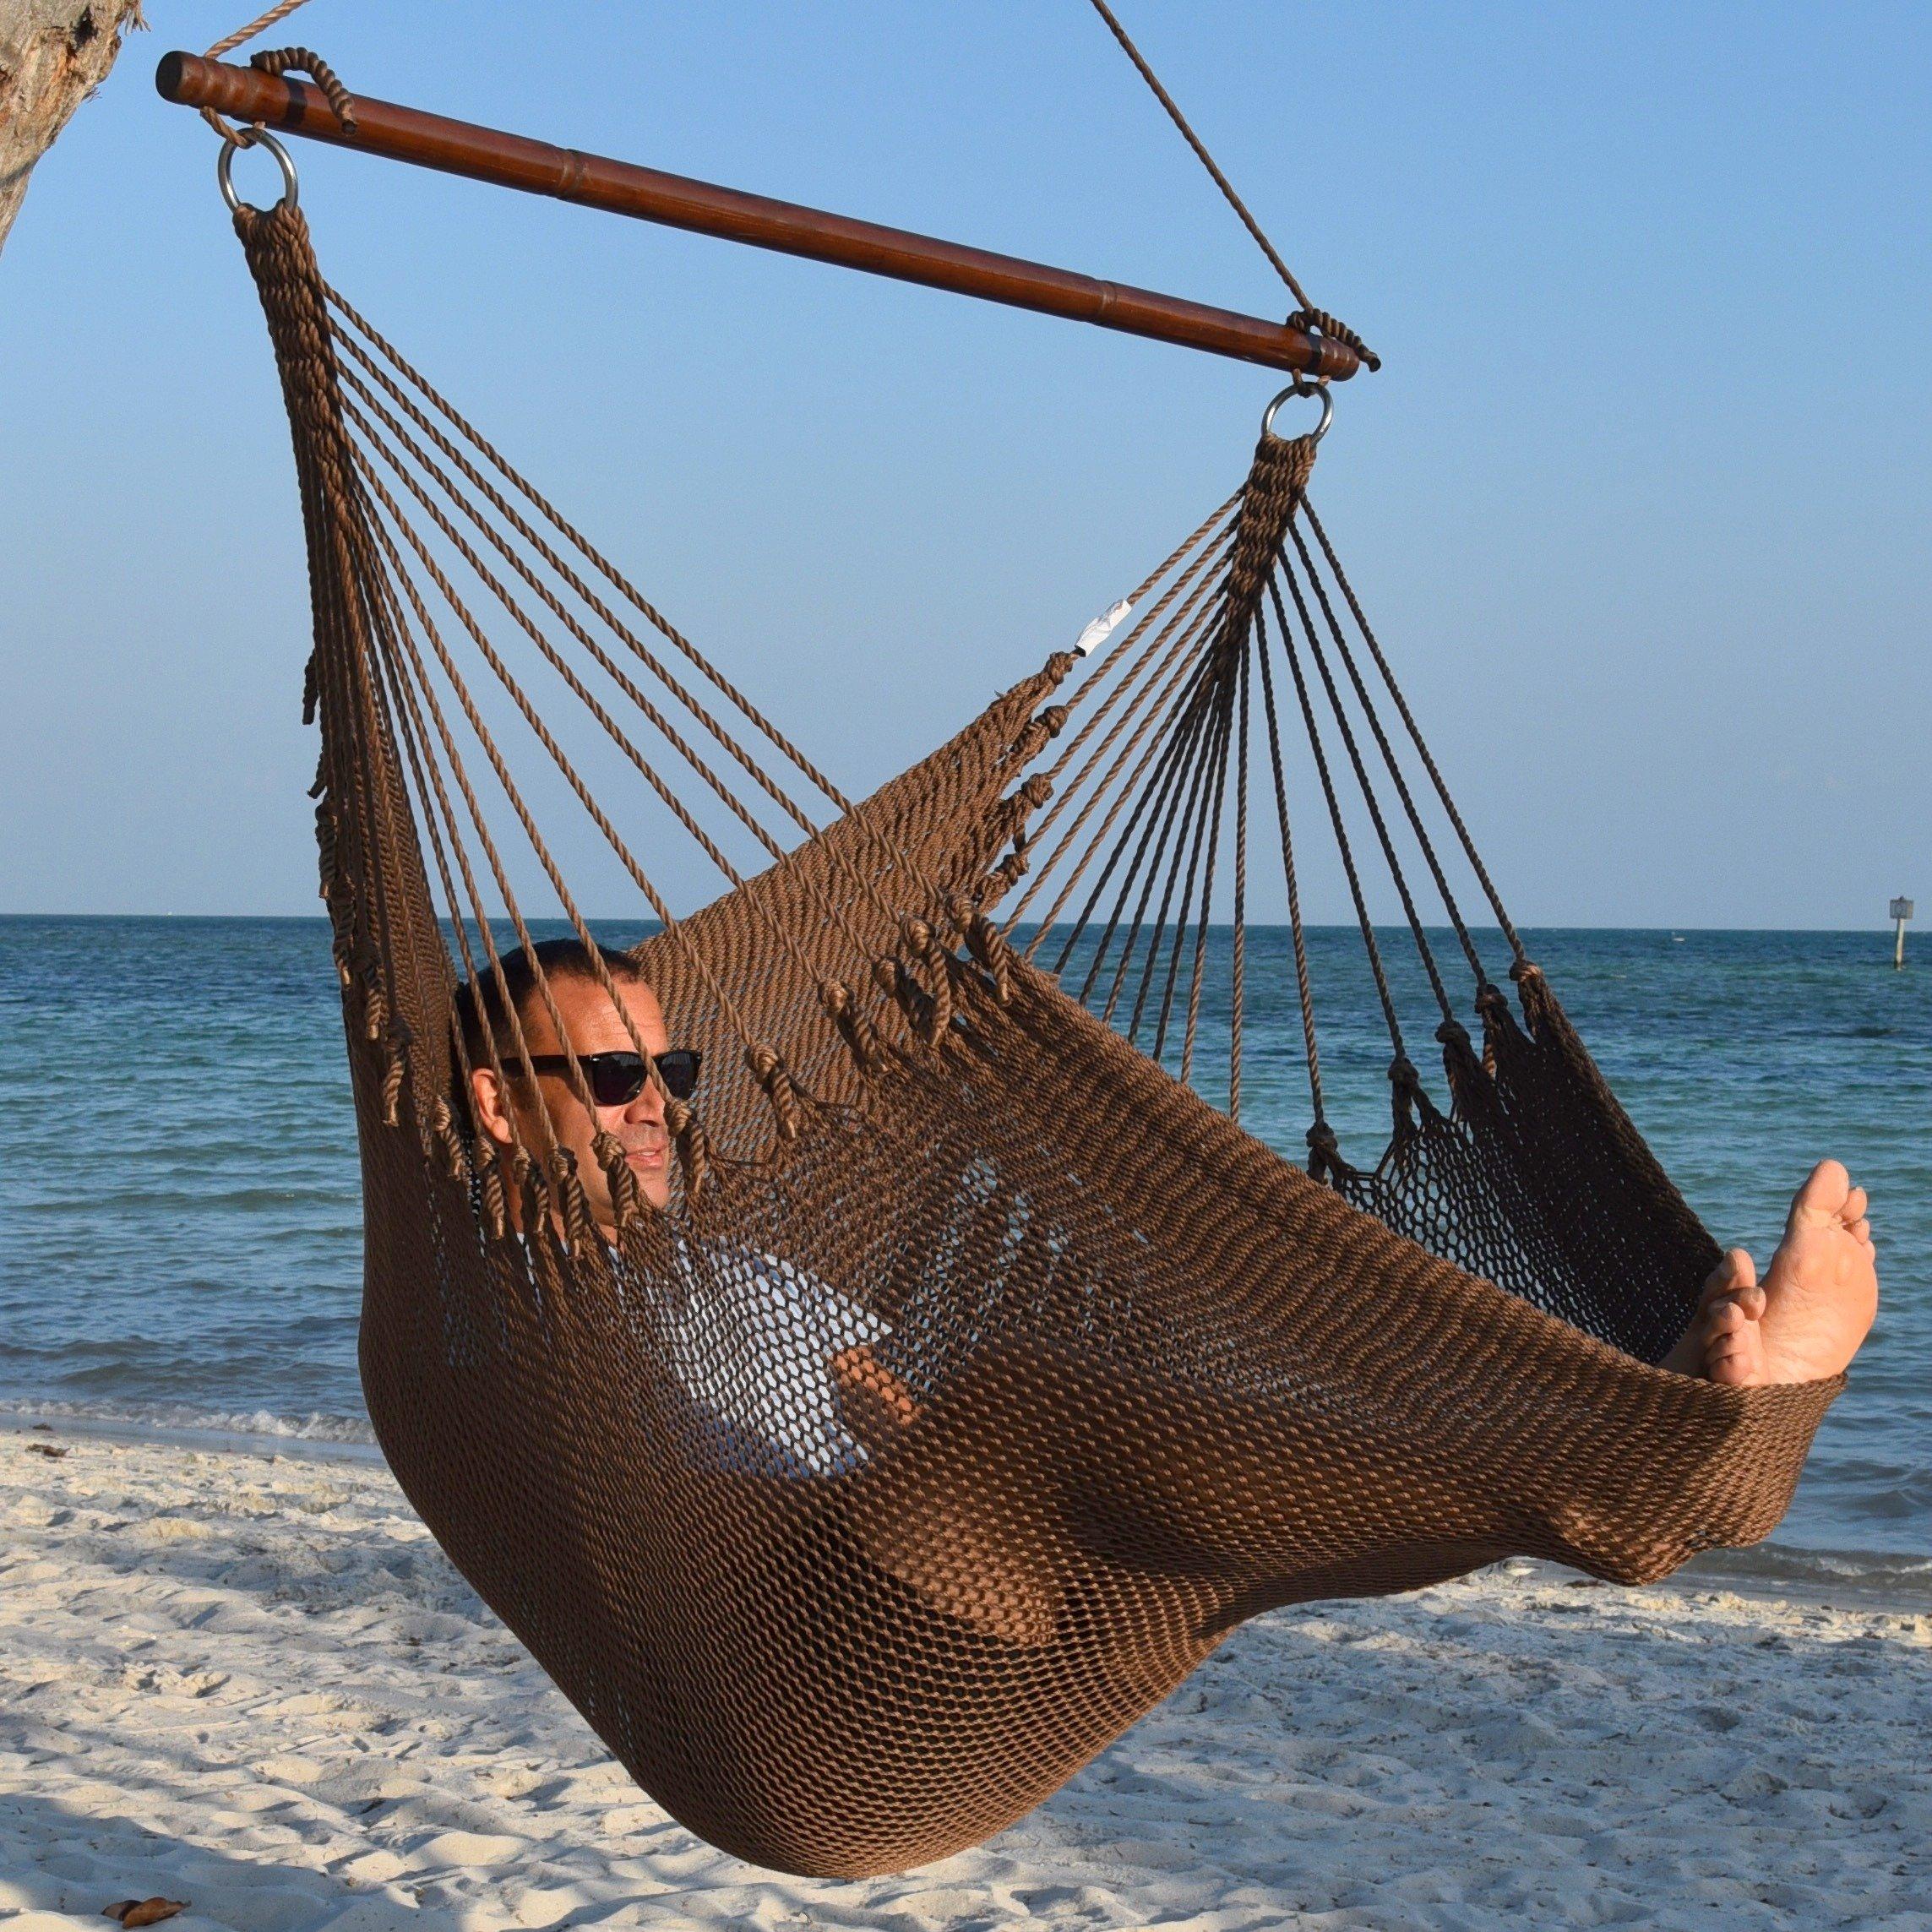 Jumbo Caribbean Hammock Chair with Footrest - 55 inch - Soft-Spun Polyester - Mocha